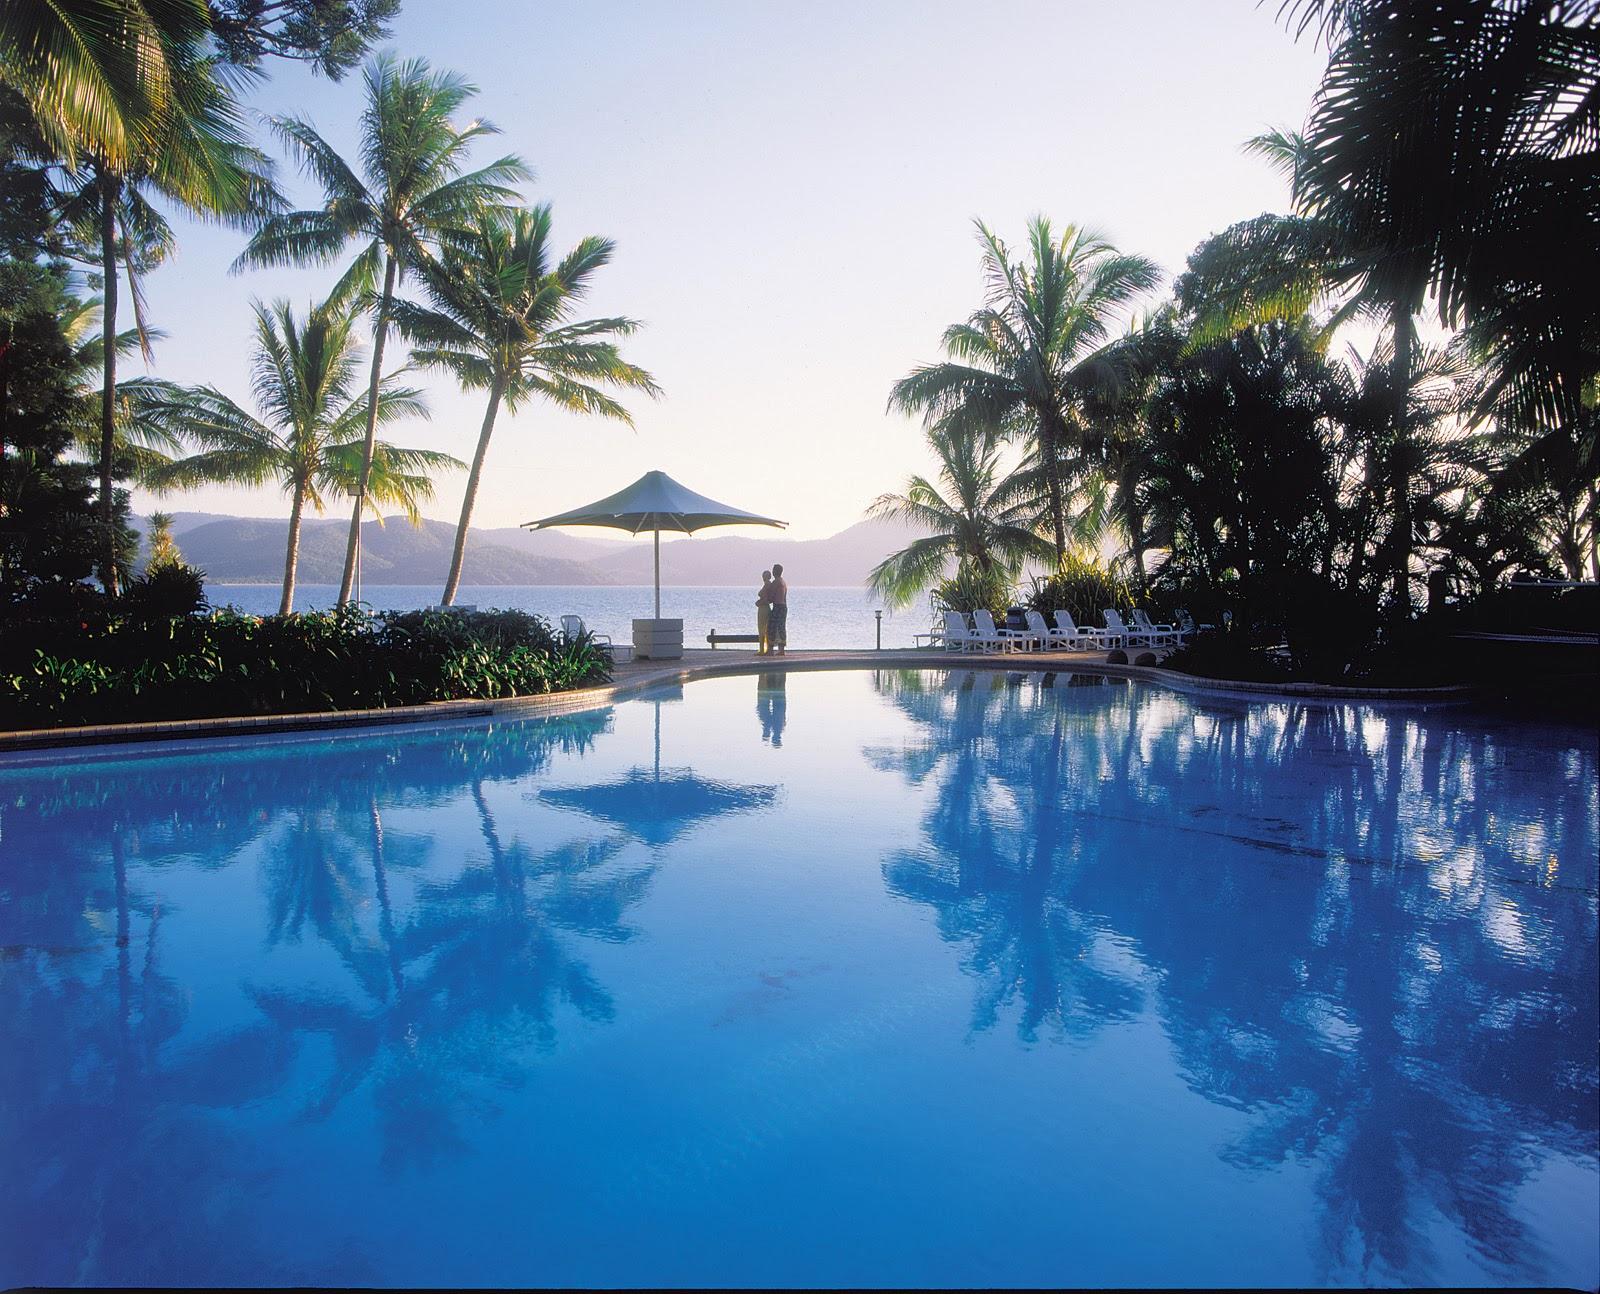 daydream island australia travel guide tourist destinations. Black Bedroom Furniture Sets. Home Design Ideas